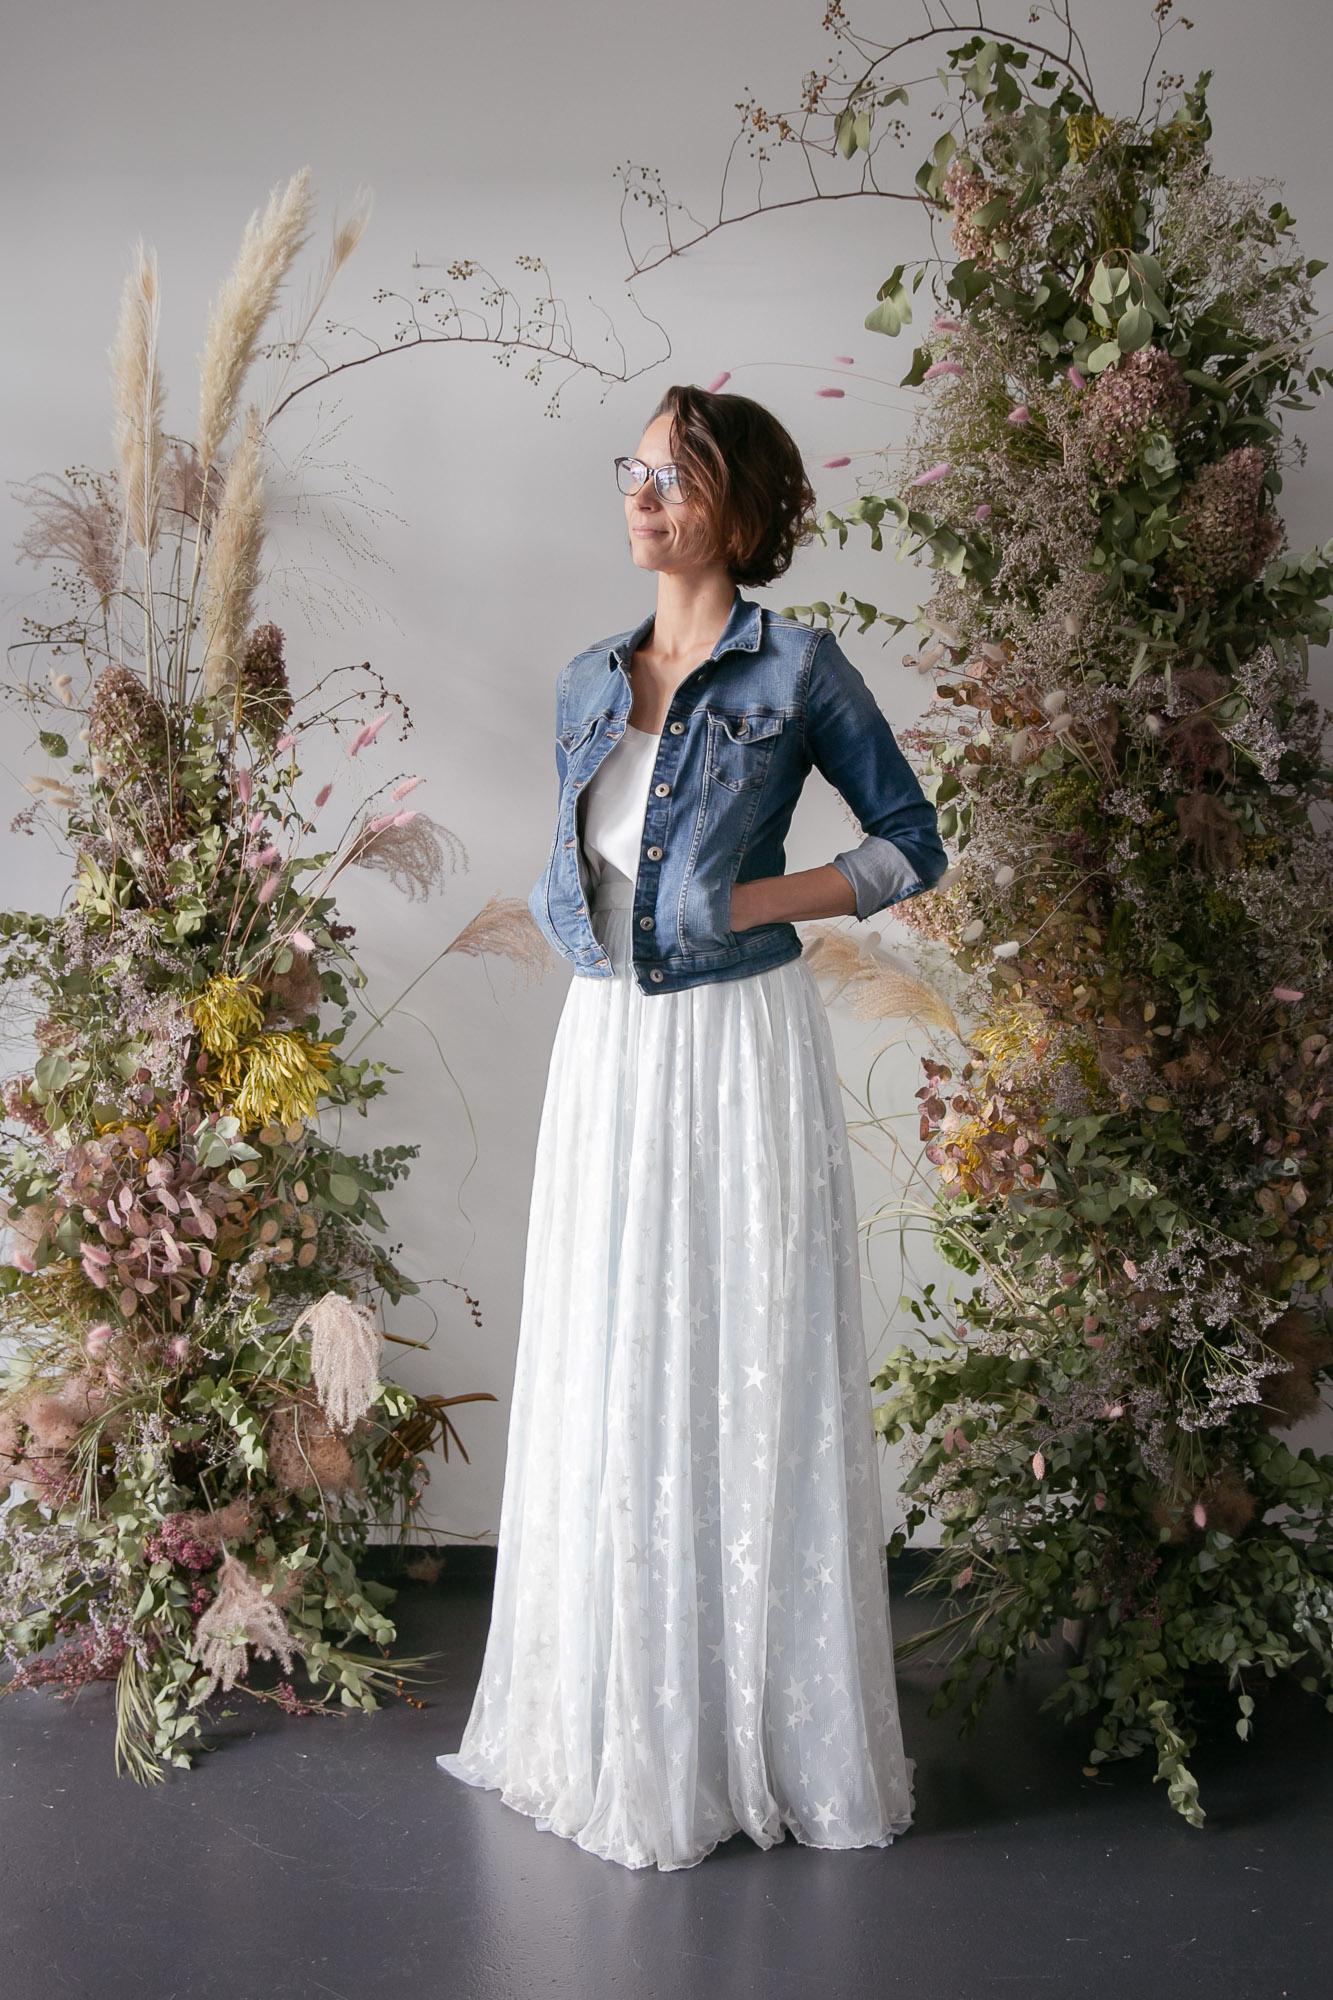 noni Brautmode, Softtüllrock in Blau mit Überrock aus Sternentüll zu Jeansjacke in Blau